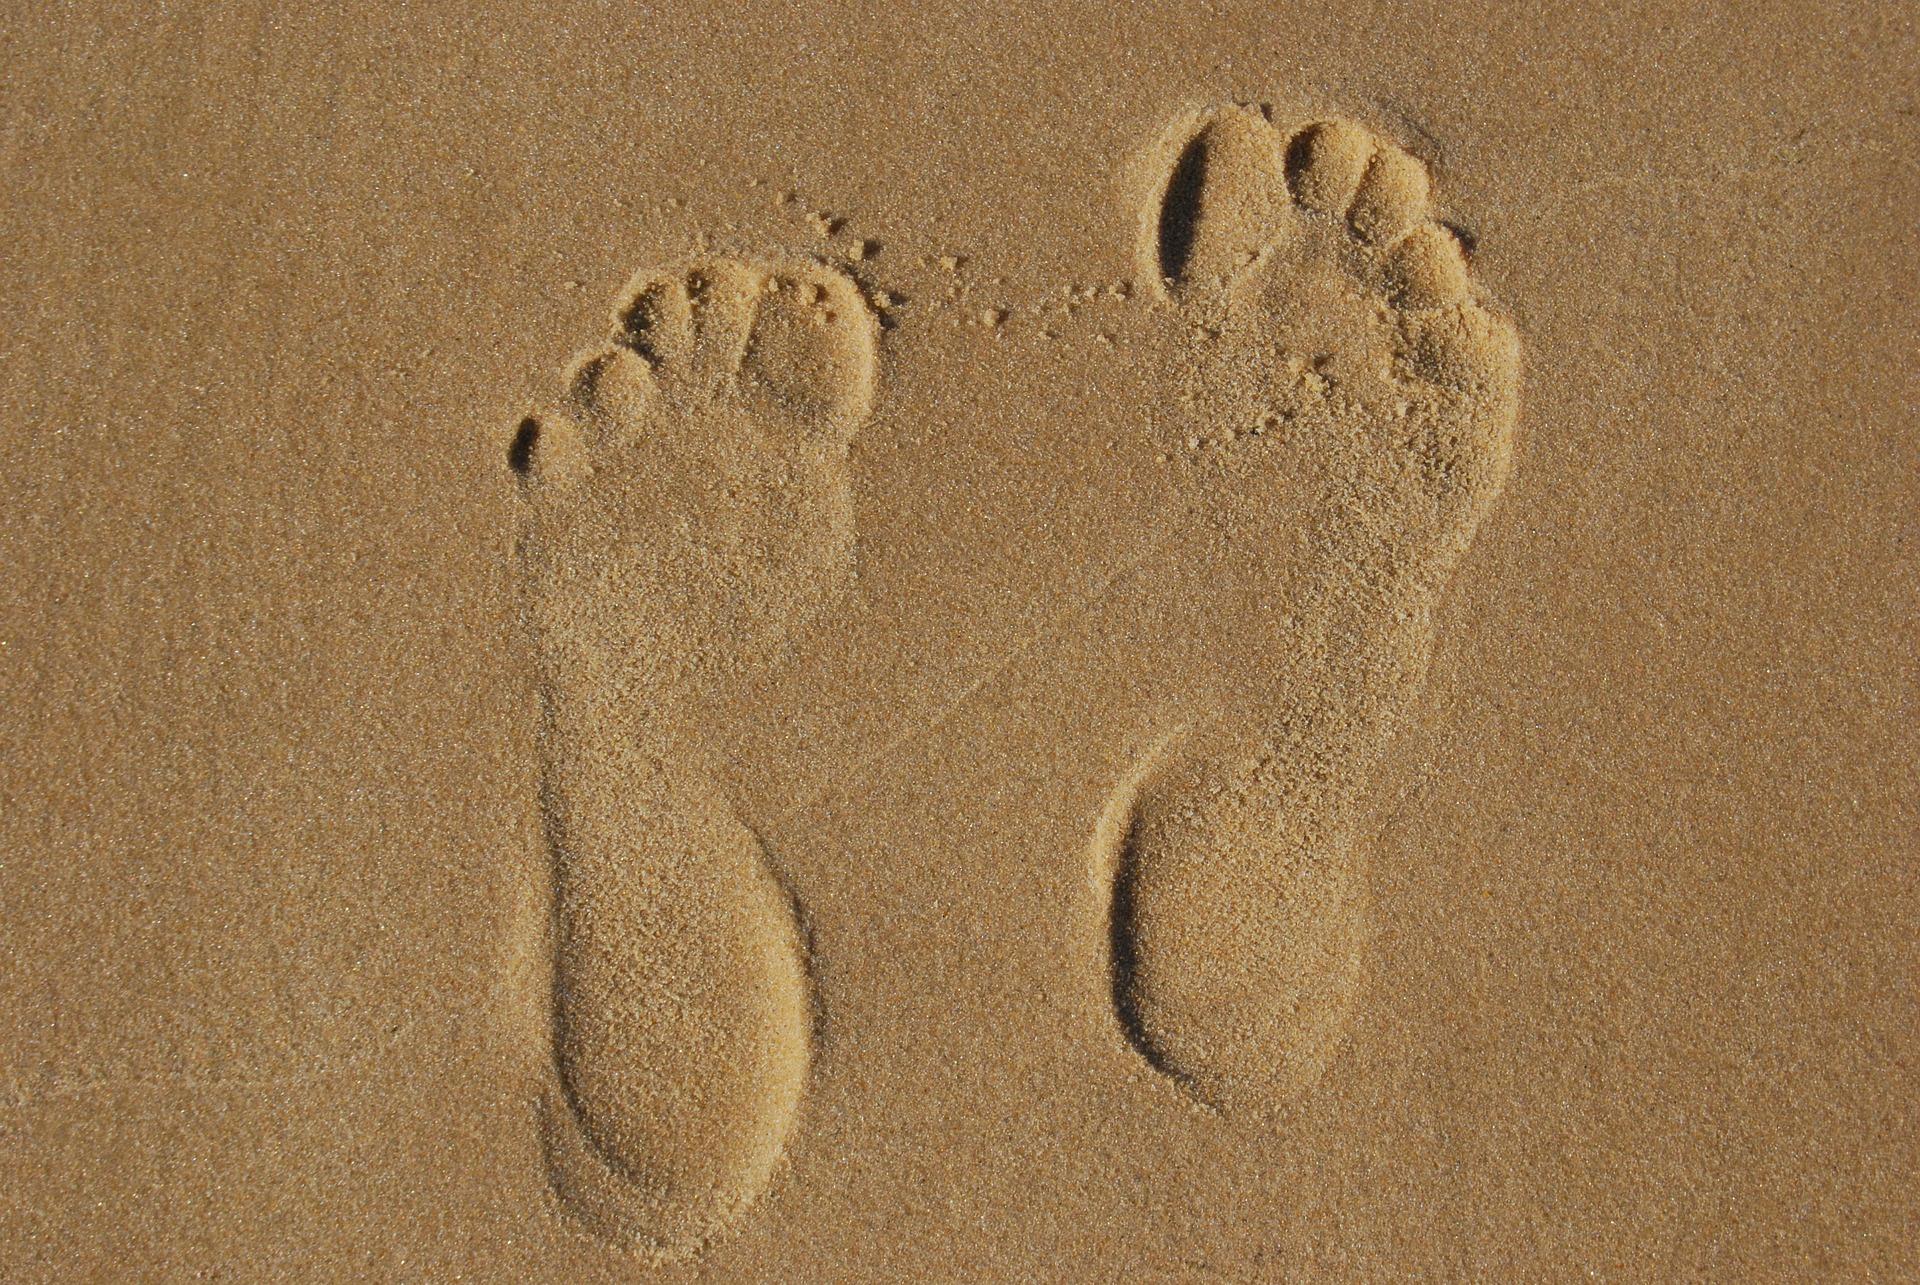 sand-1677743_1920